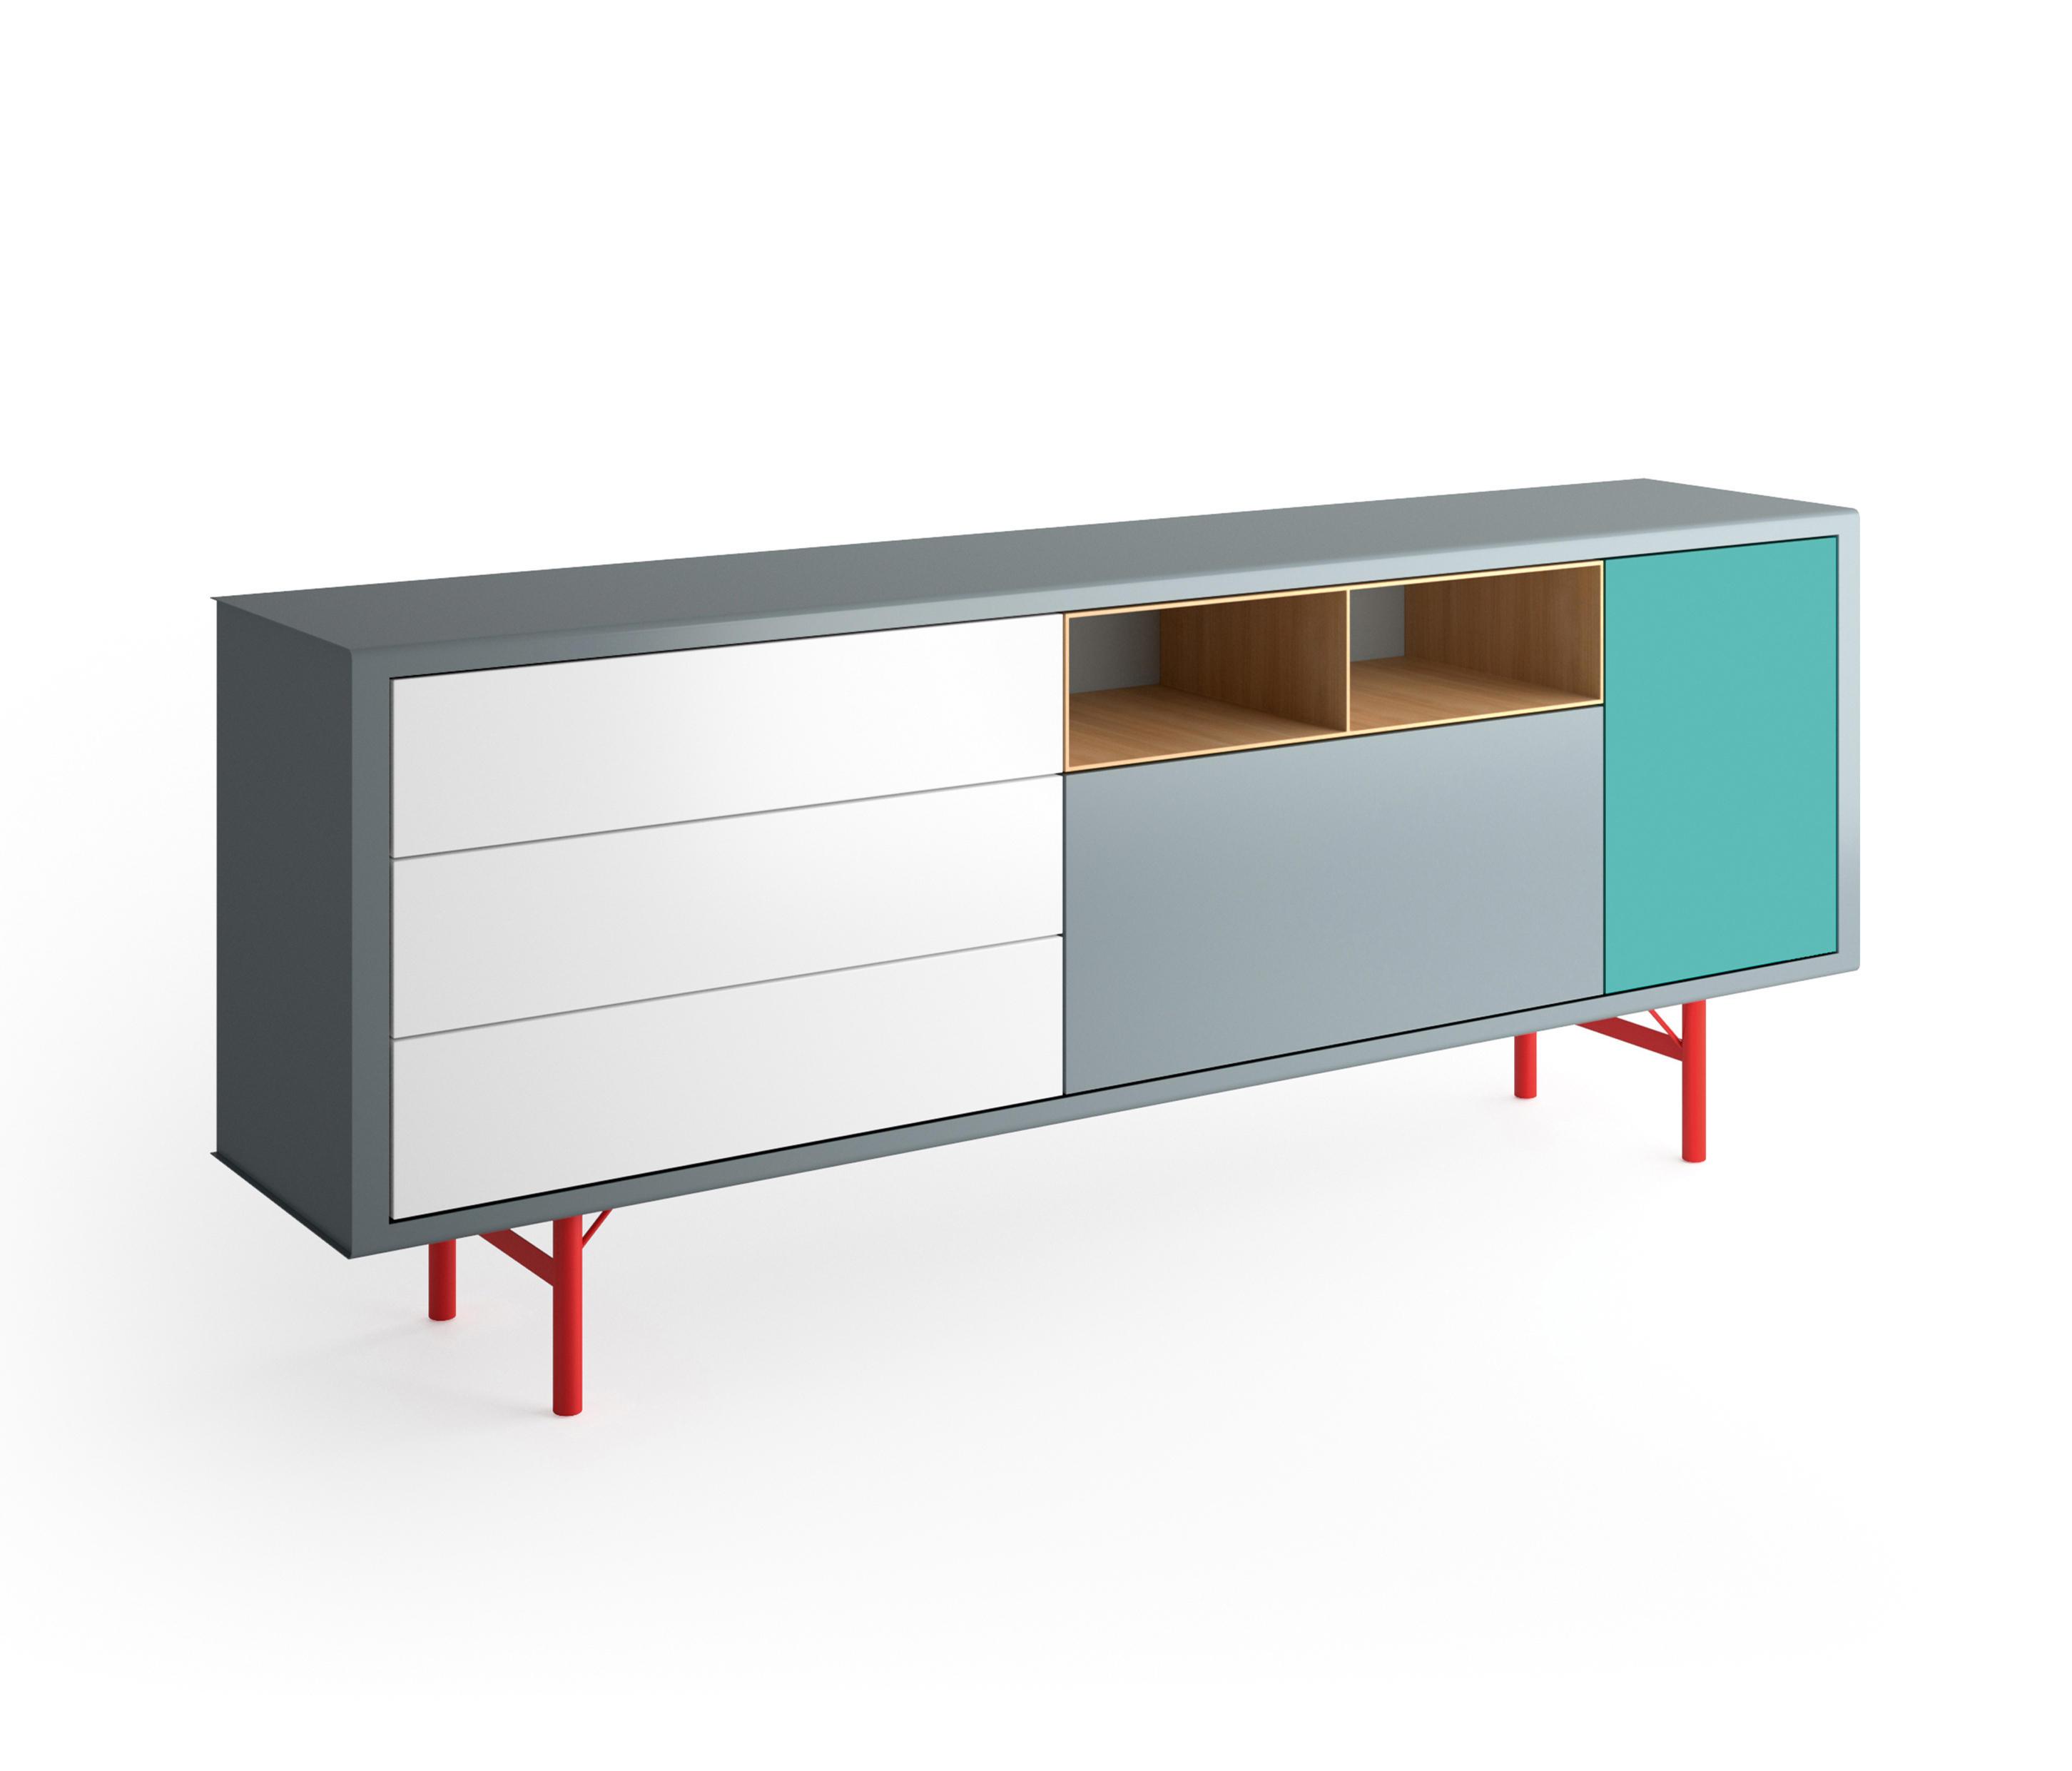 Modular s36 sideboard sideboards from m ller for Wohnlandschaft planen